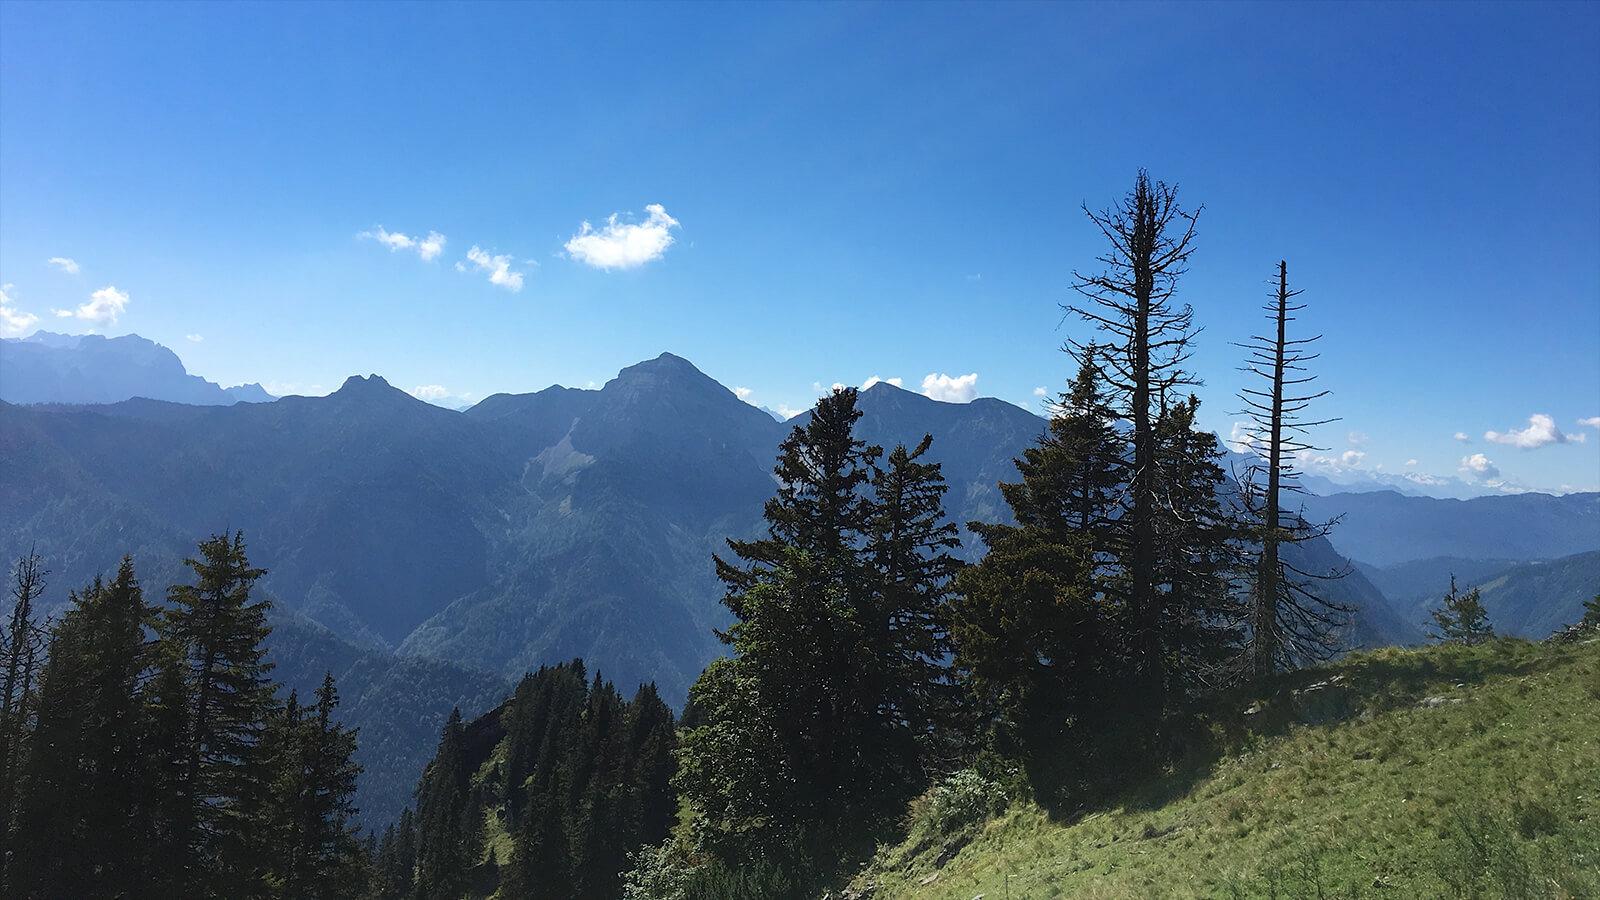 Bergwanderung Rauschberg in Ruhpolding 1.000 Höhenmeter